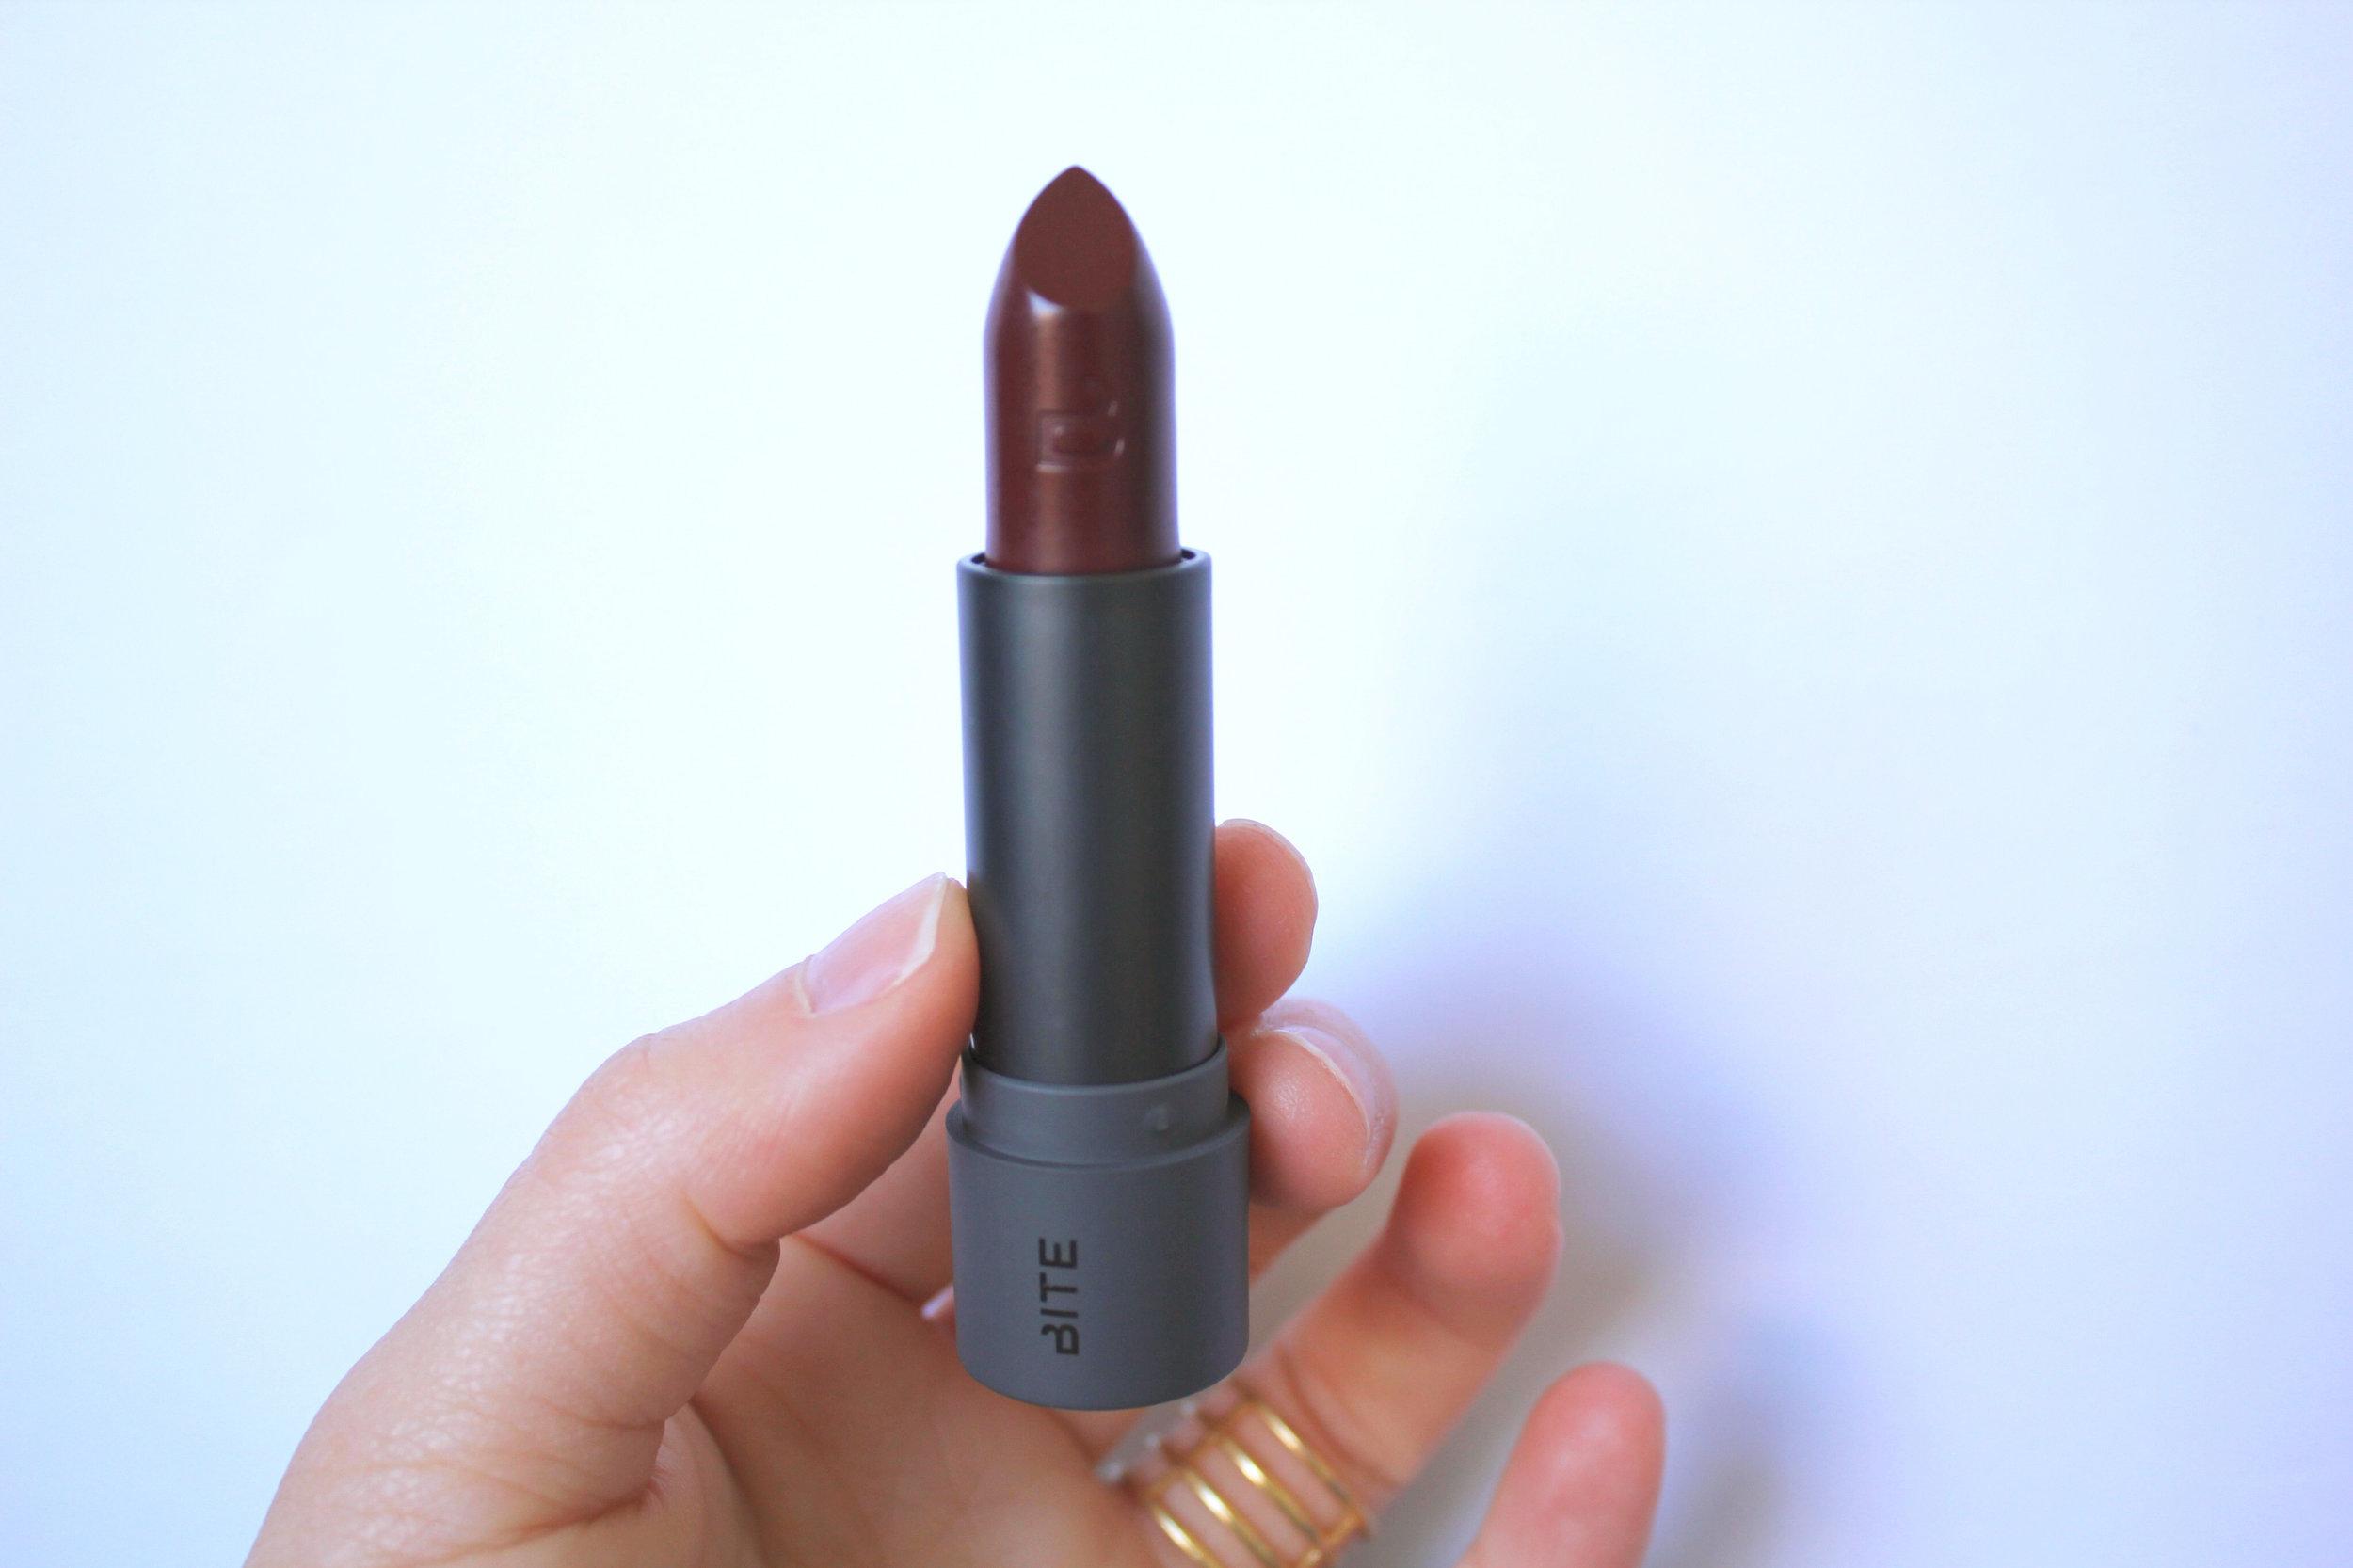 Bite Beauty Amuse Bouche lipstick in Liquorice (see number 10).